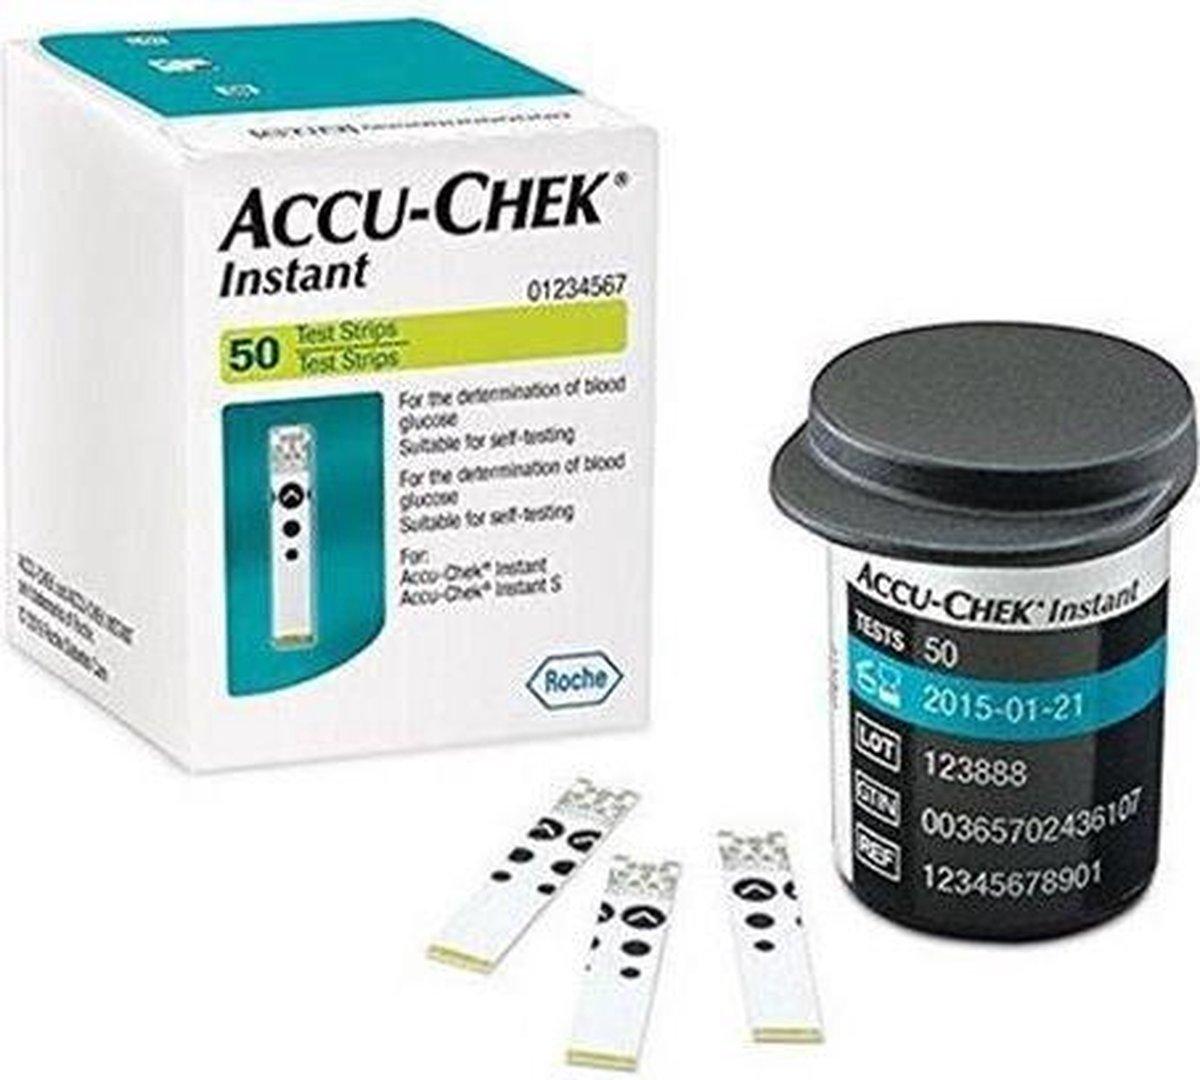 Accu Chek Instant per 50 teststrips